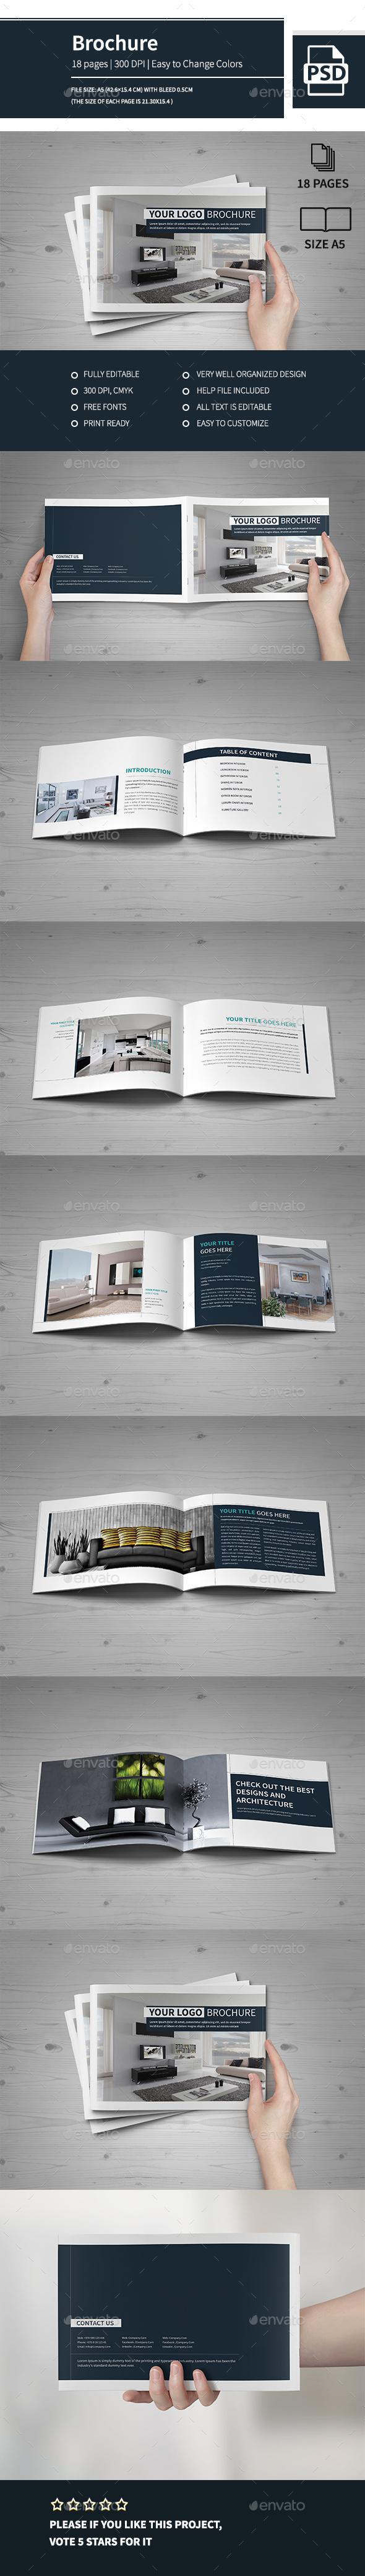 Multipurpose Modern A5 Catalogue Brochure 2016 - Catalogs Brochures